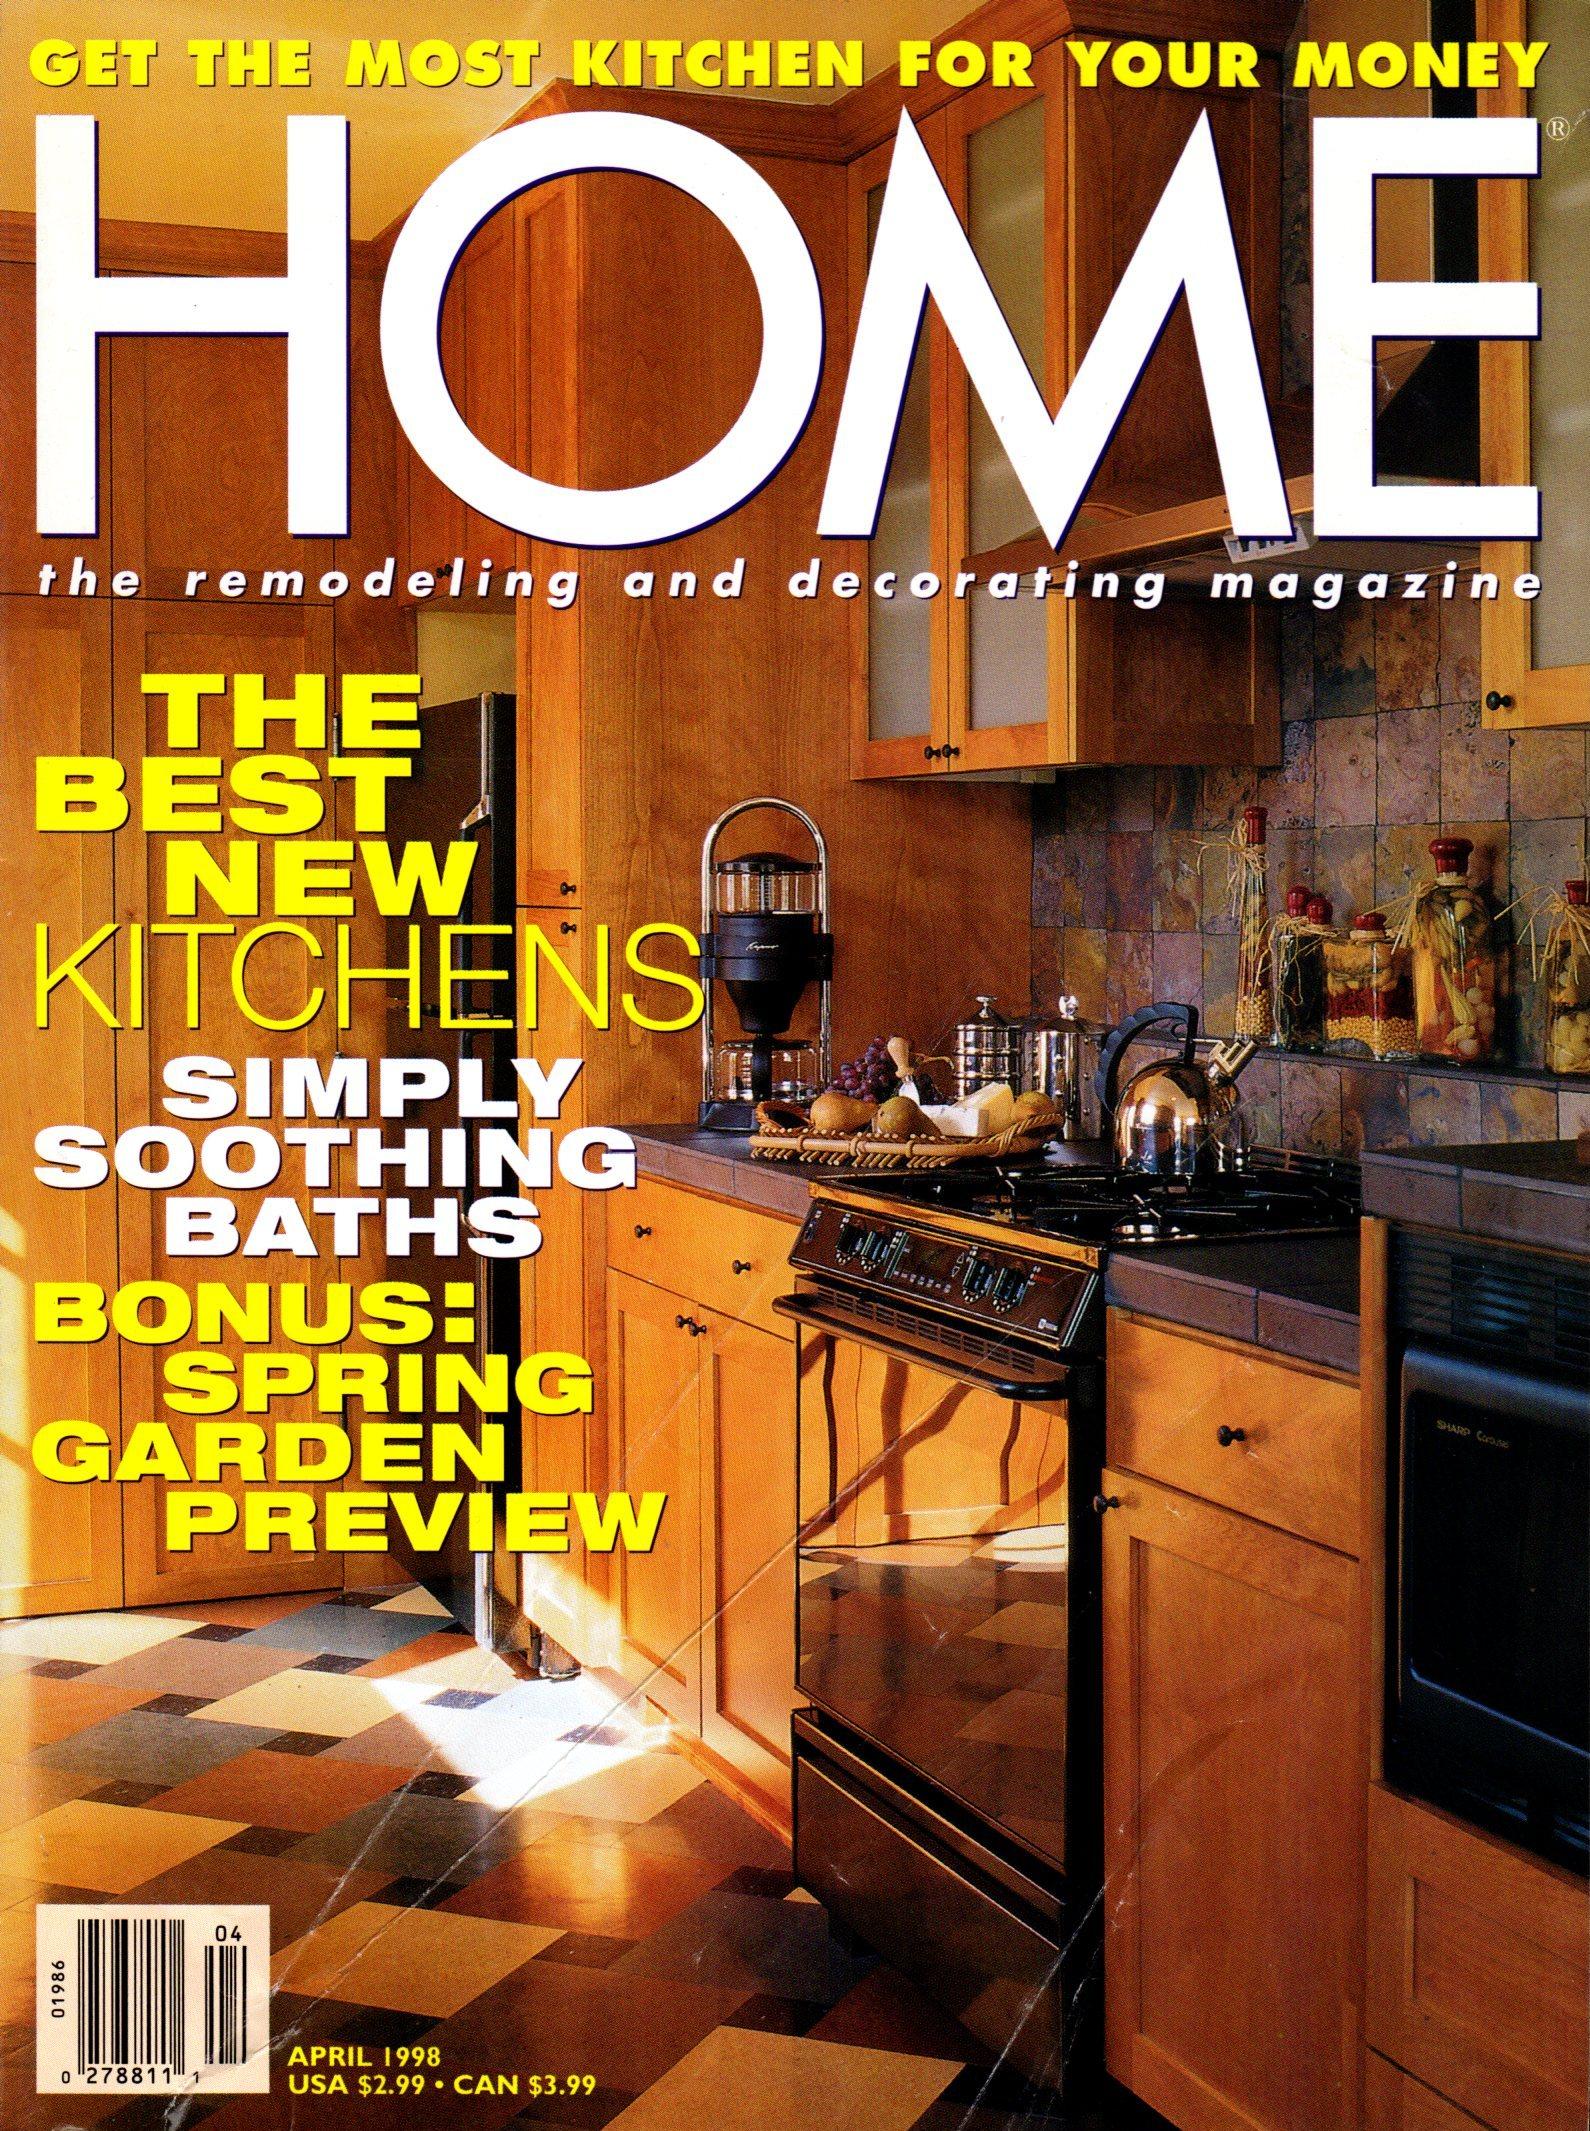 Home, April 1998